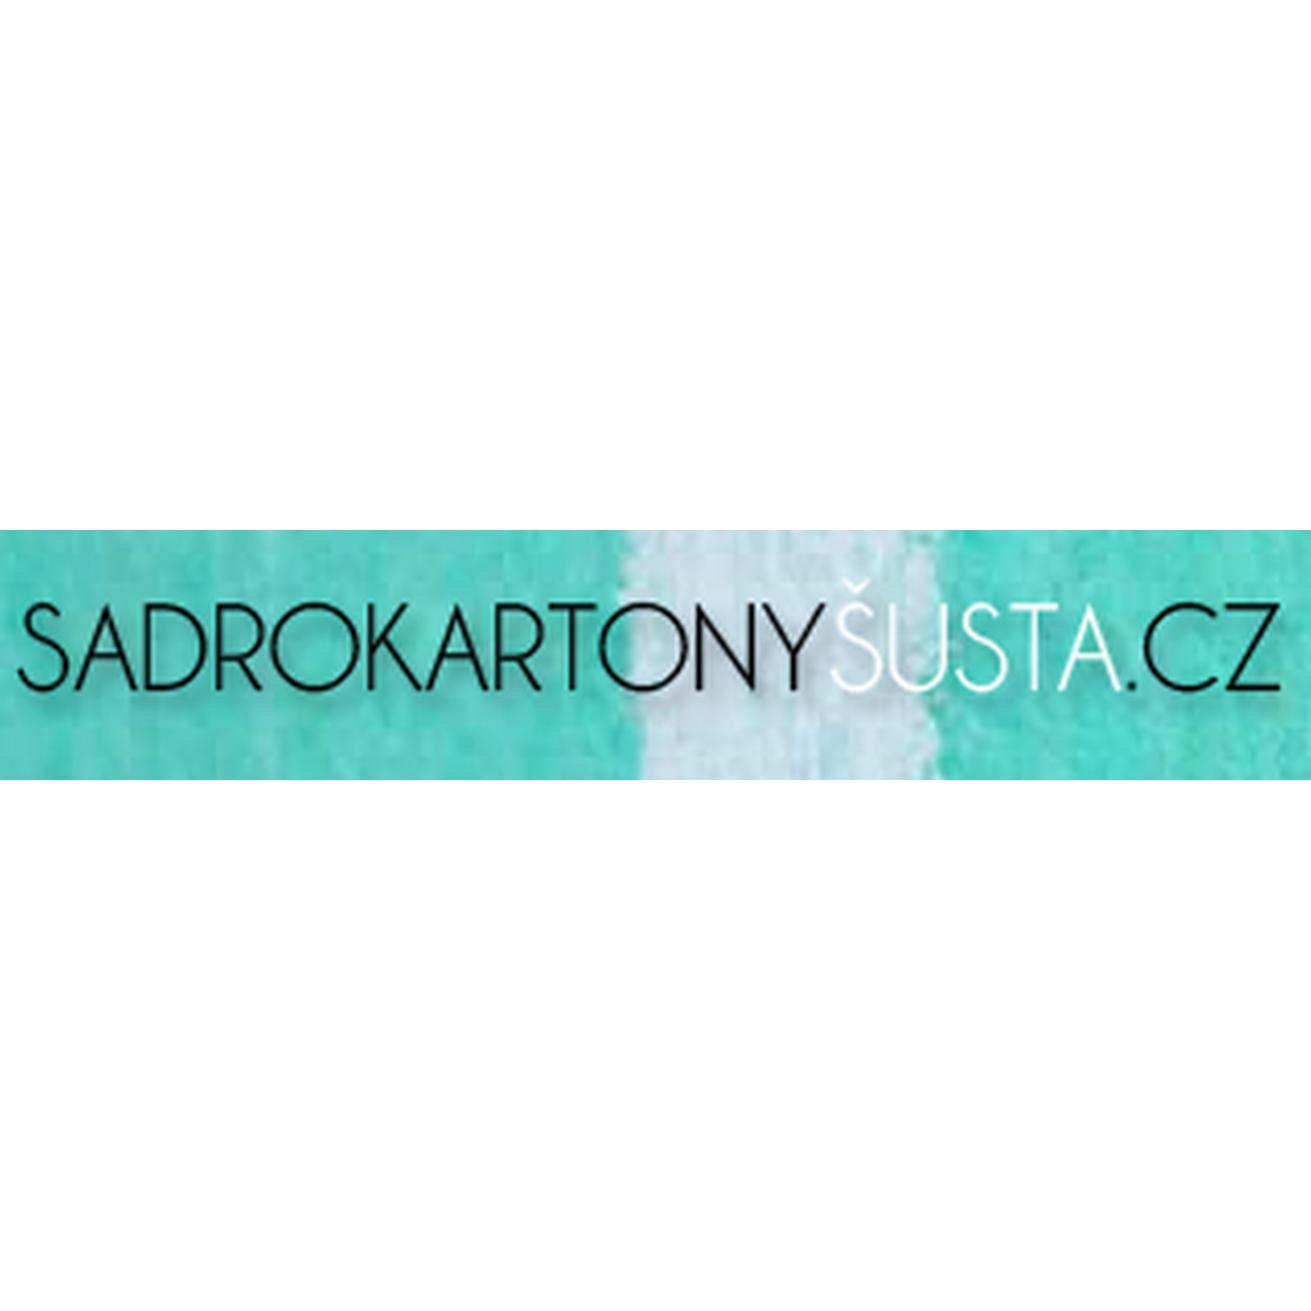 Sádrokartony - František Šusta